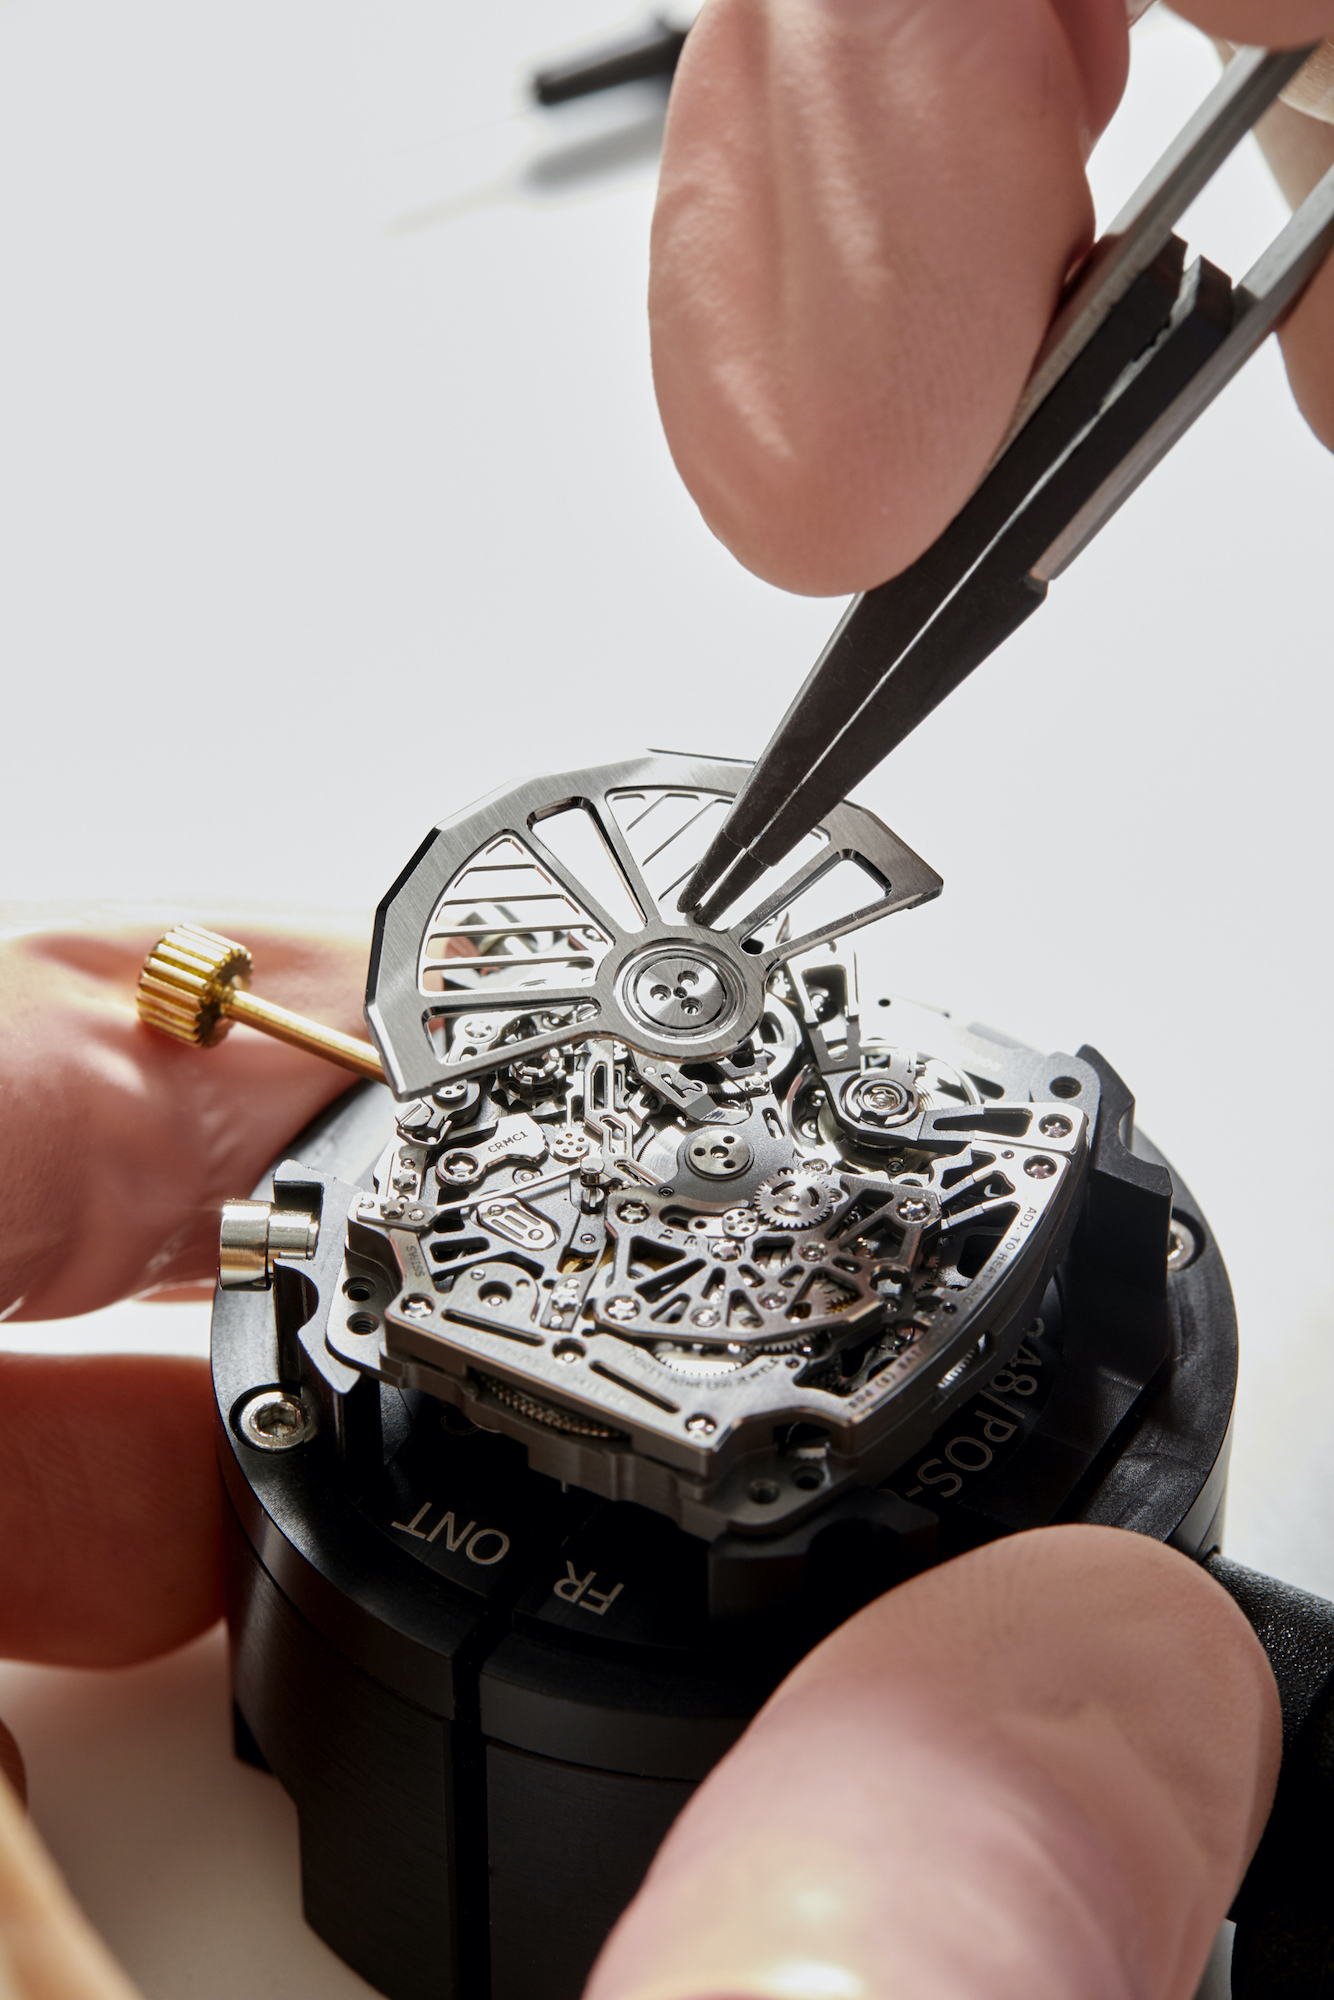 Richard Mille RM 72-01 Lifestyle Chronograph detalle montaje de rotor